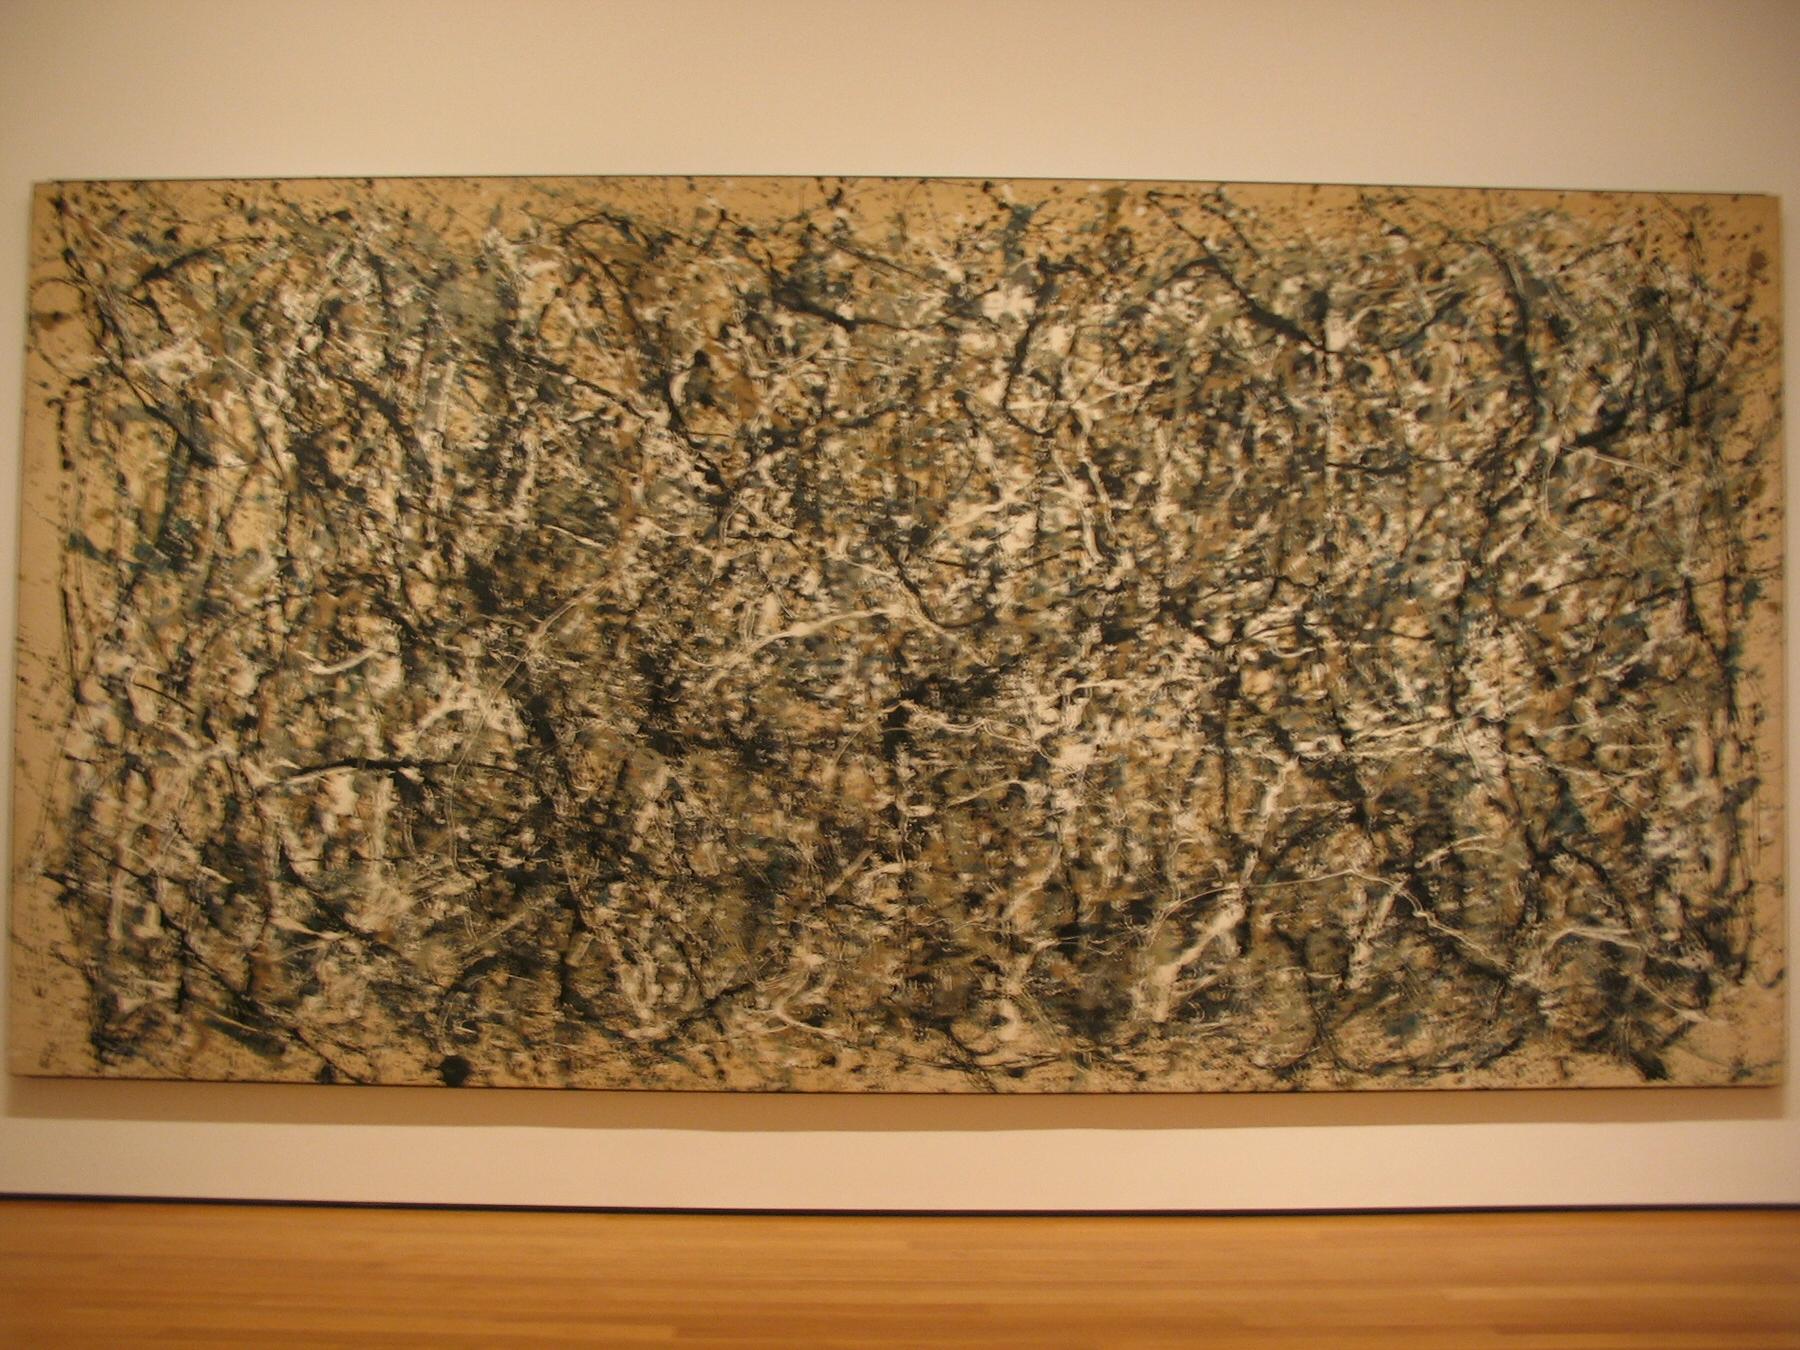 Jackson Pollock Number 1